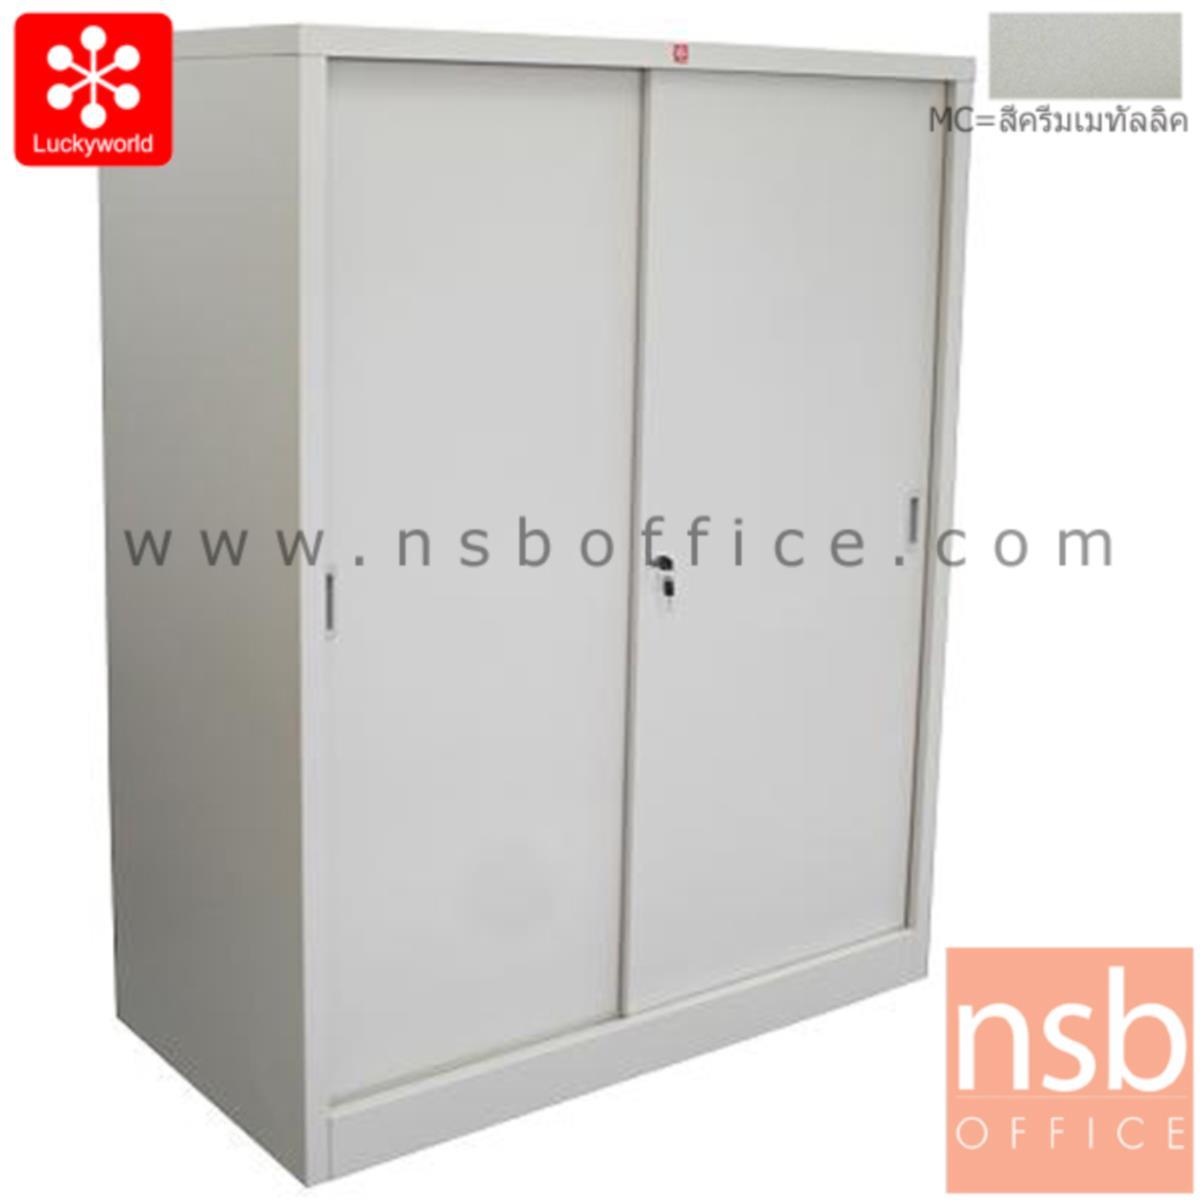 E31A071:ตู้เสื้อผ้าเตี้ย 2 บานเลื่อนทึบ 152.5H cm. KSS-152K-MC